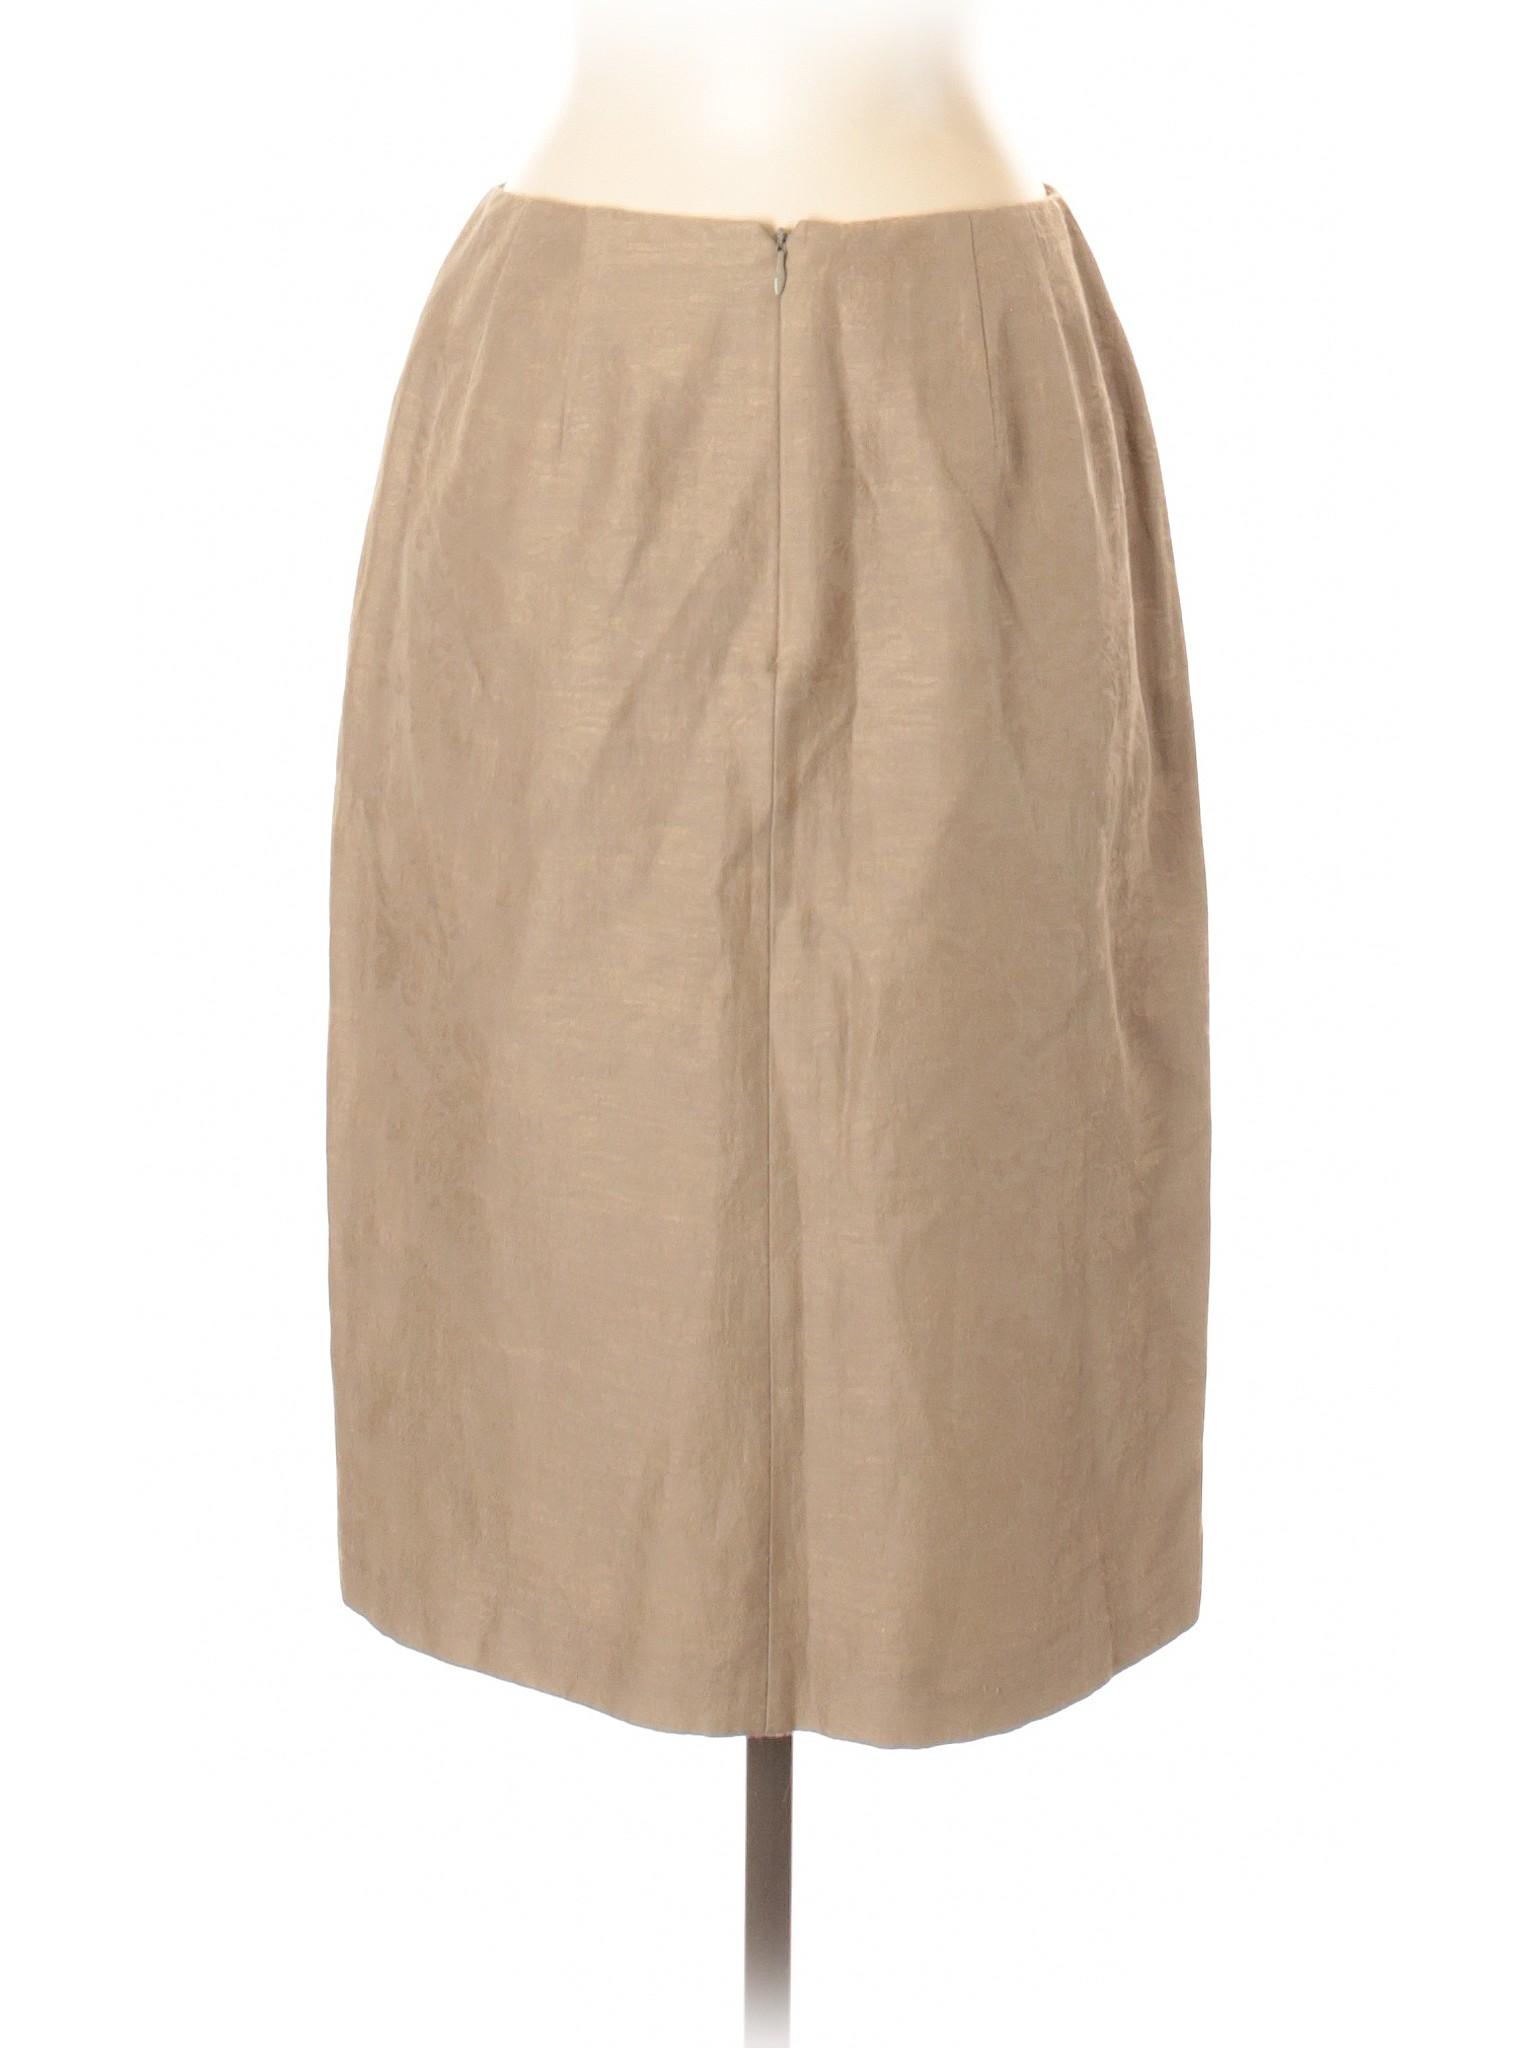 53cdaff2cd Talbots Solid Tan Silk Skirt Size 4 - 89% off   thredUP